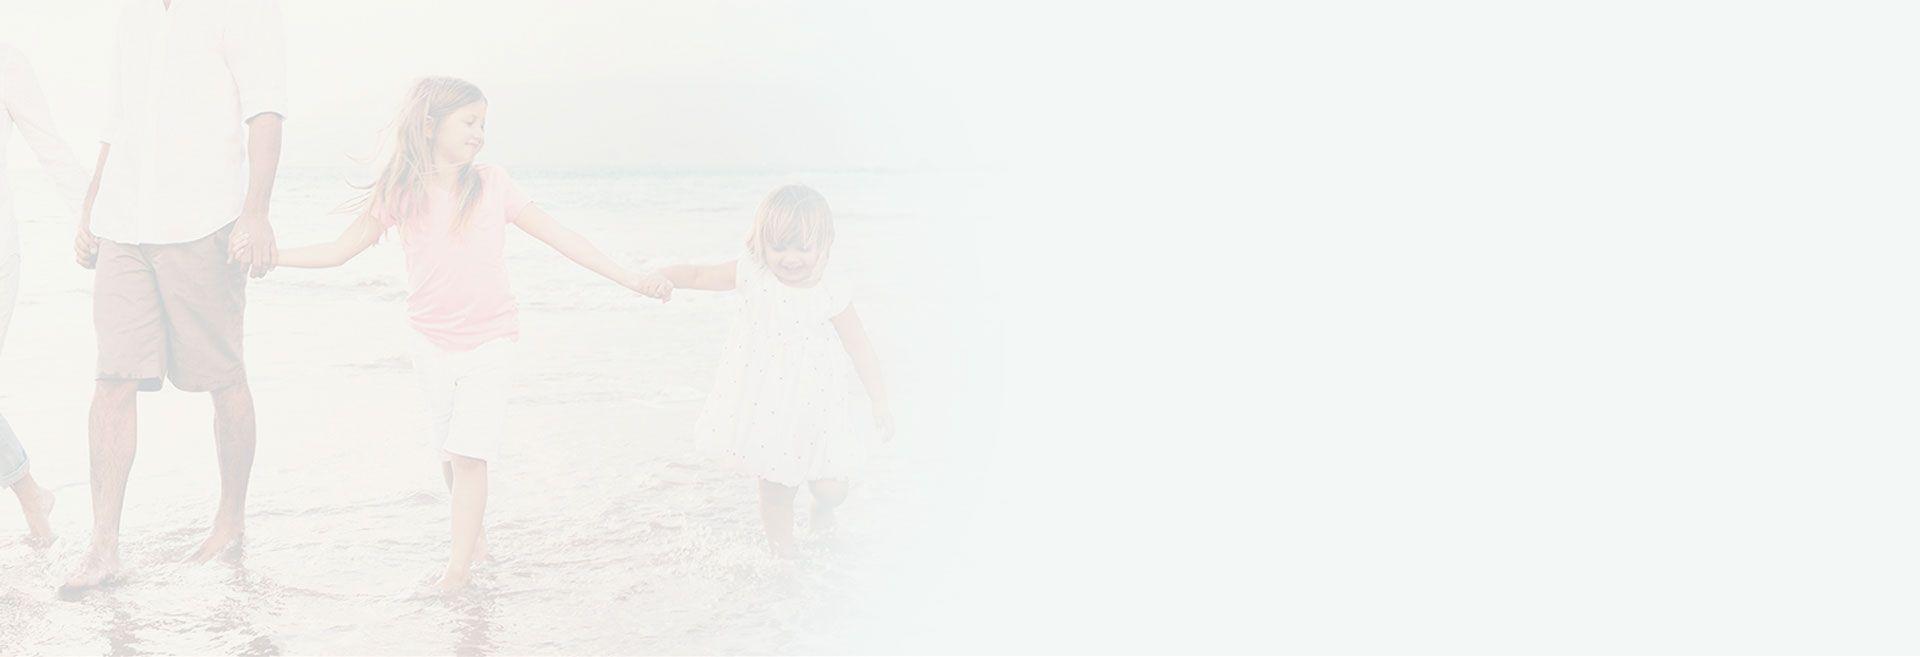 Family-Child-Reverse-fade